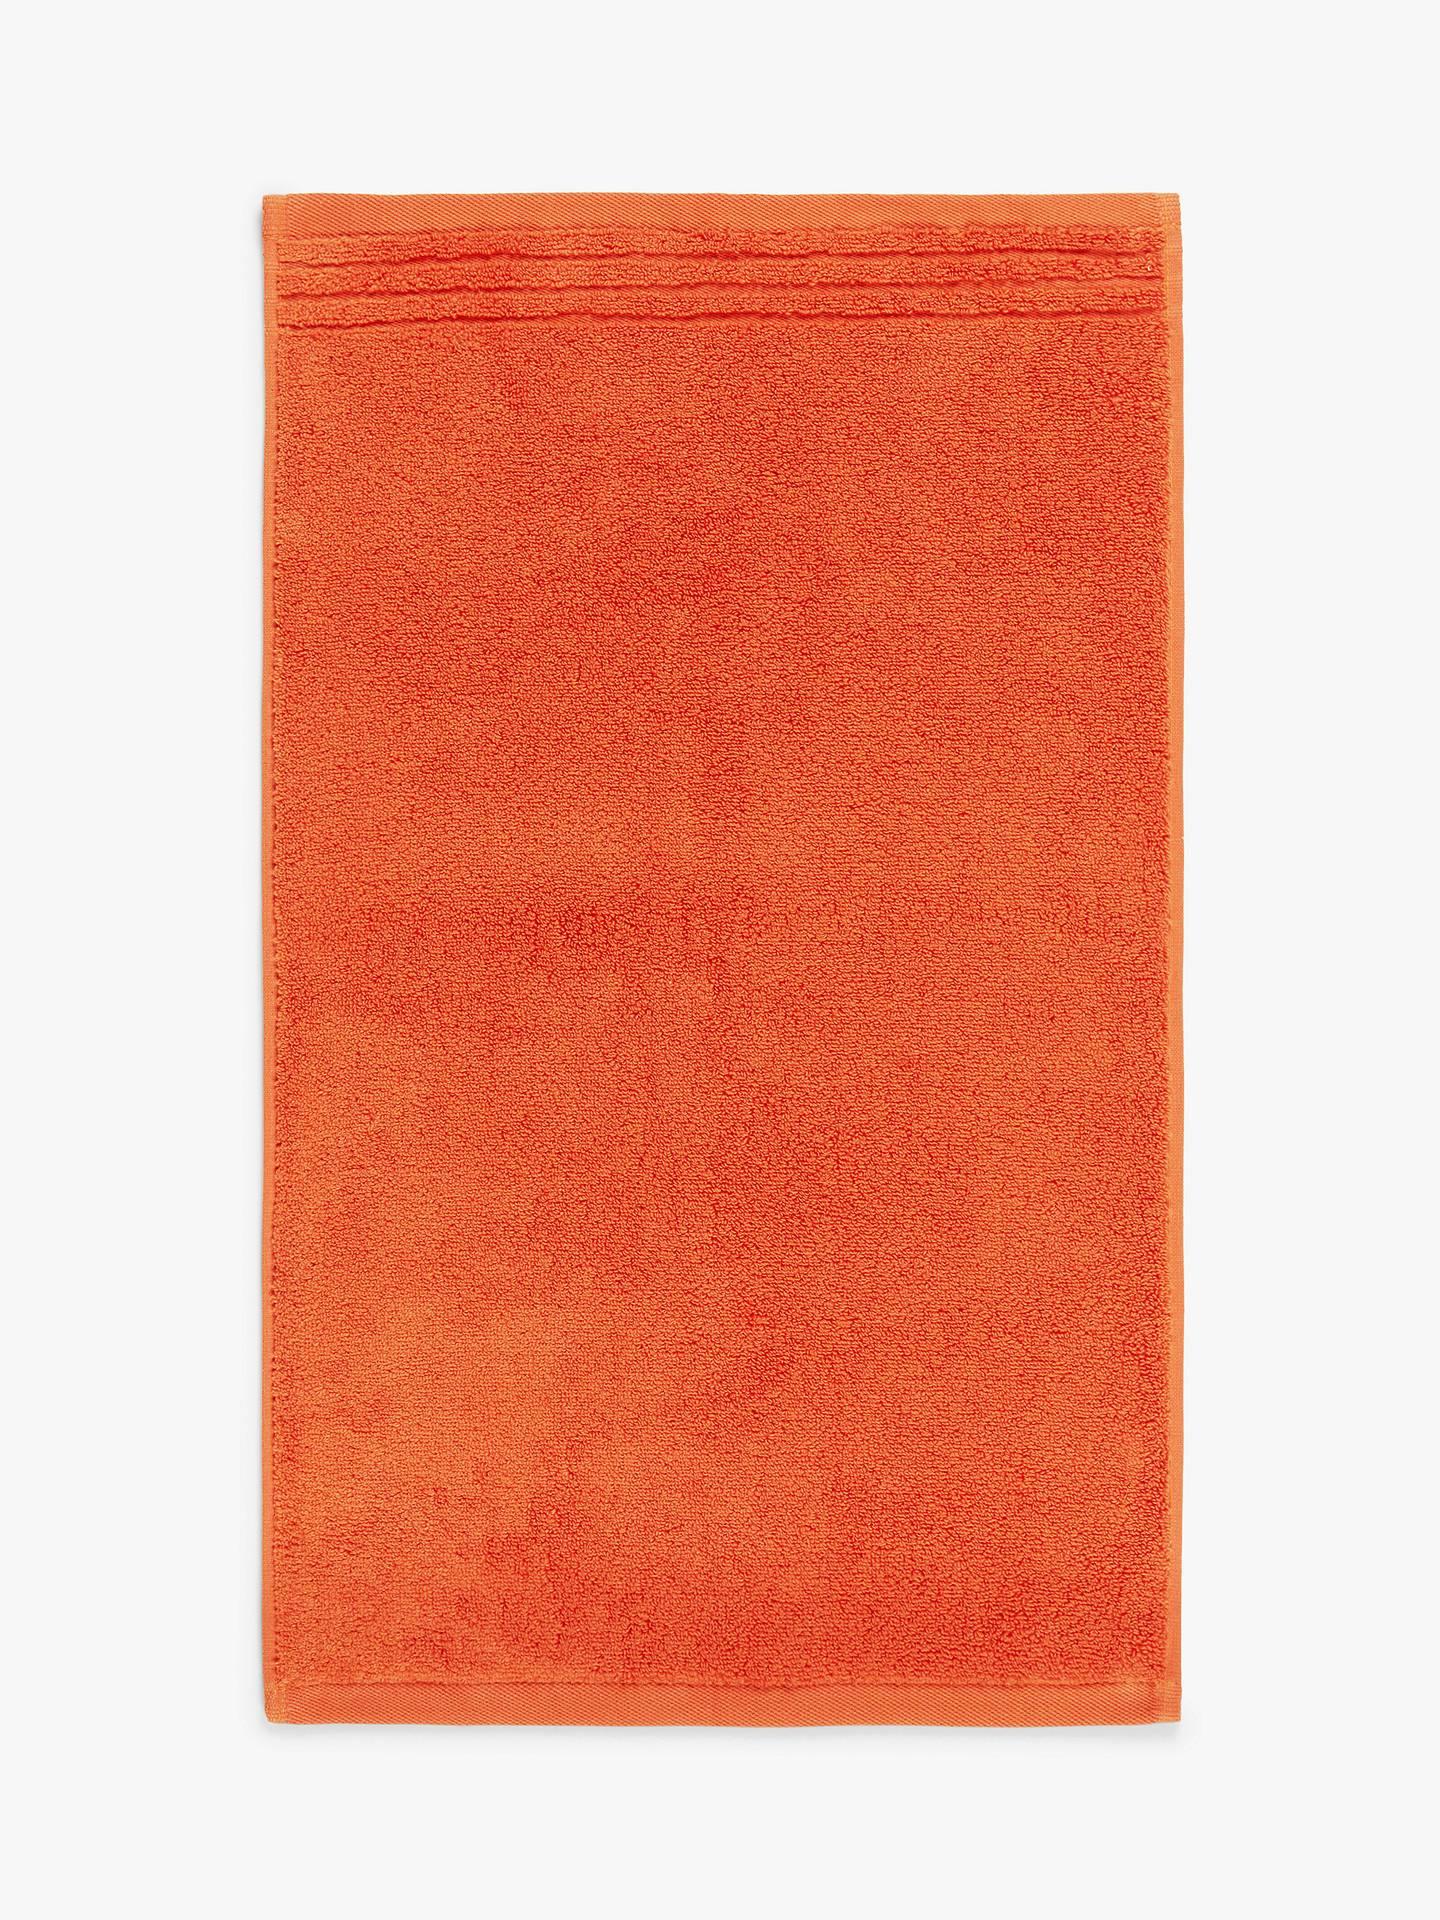 This orange bath towel form John Lewis is £13